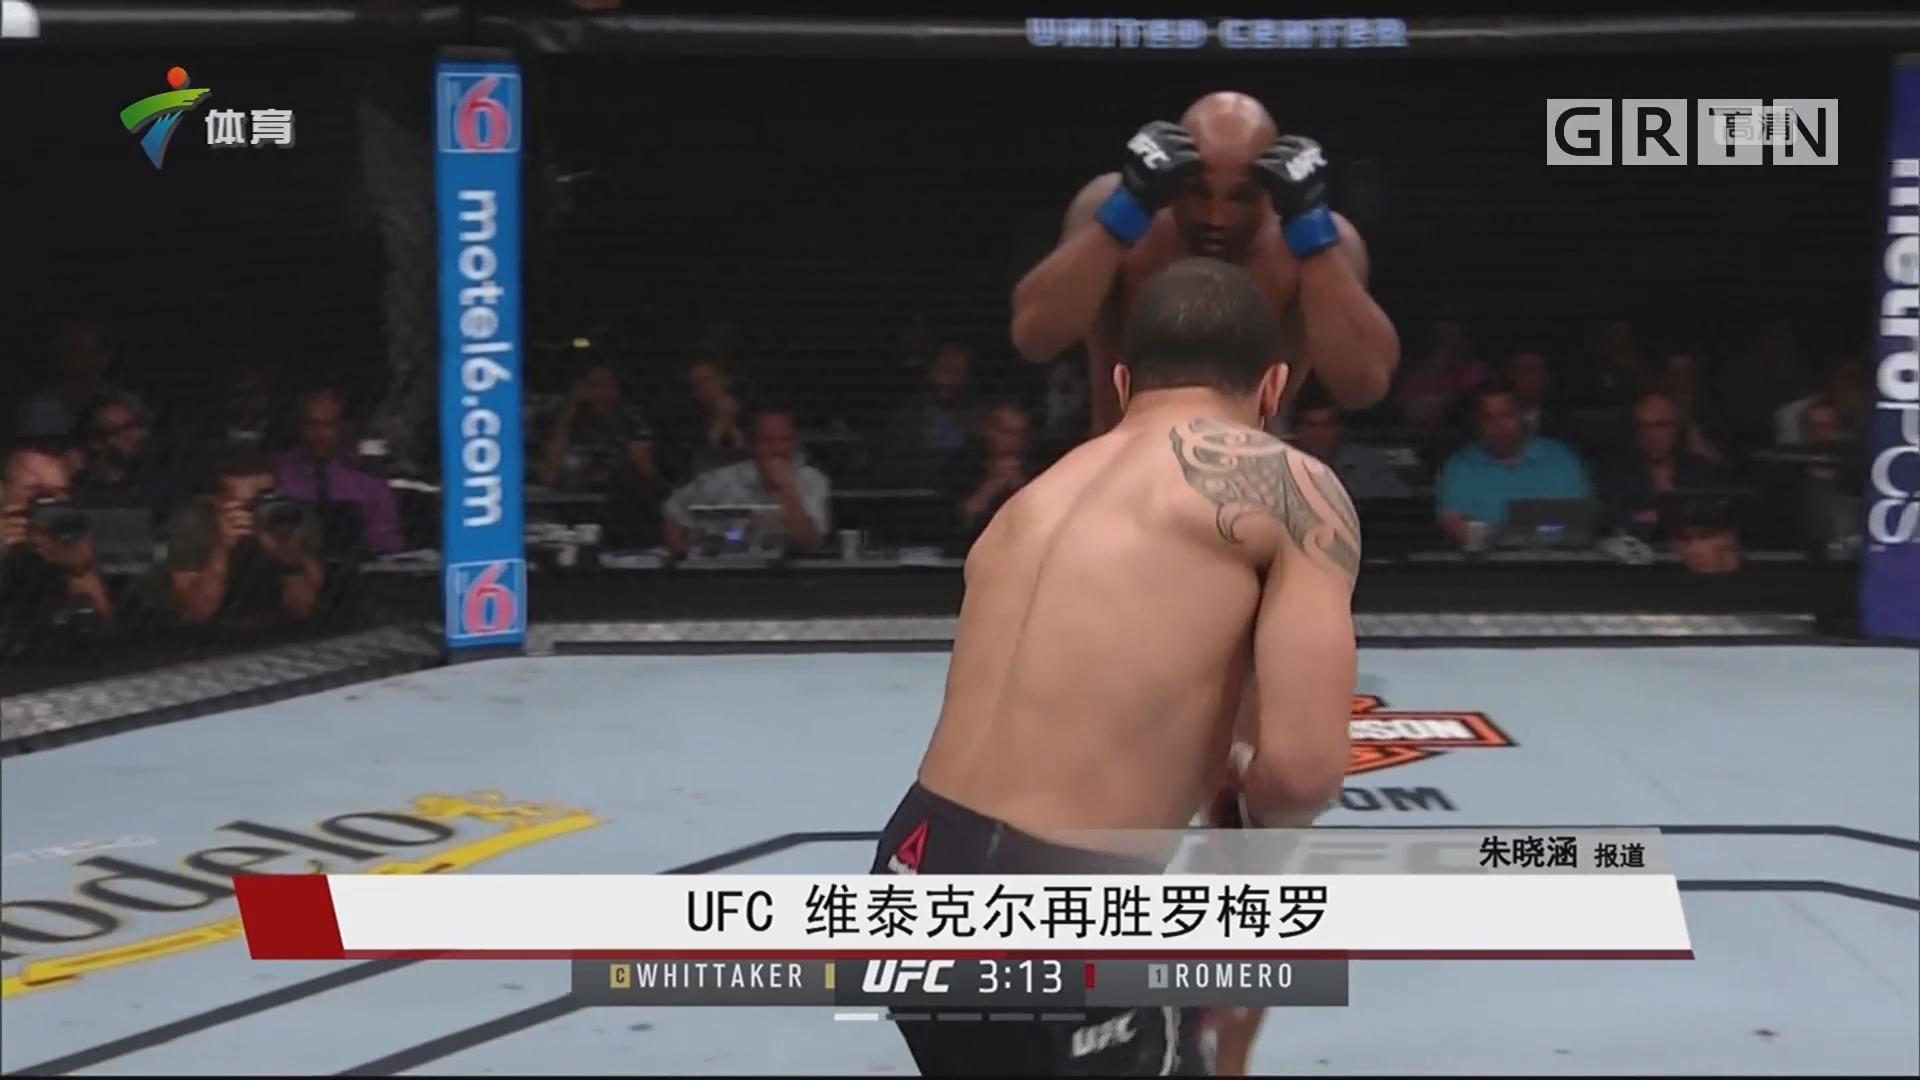 UFC 维泰克尔再胜罗梅罗